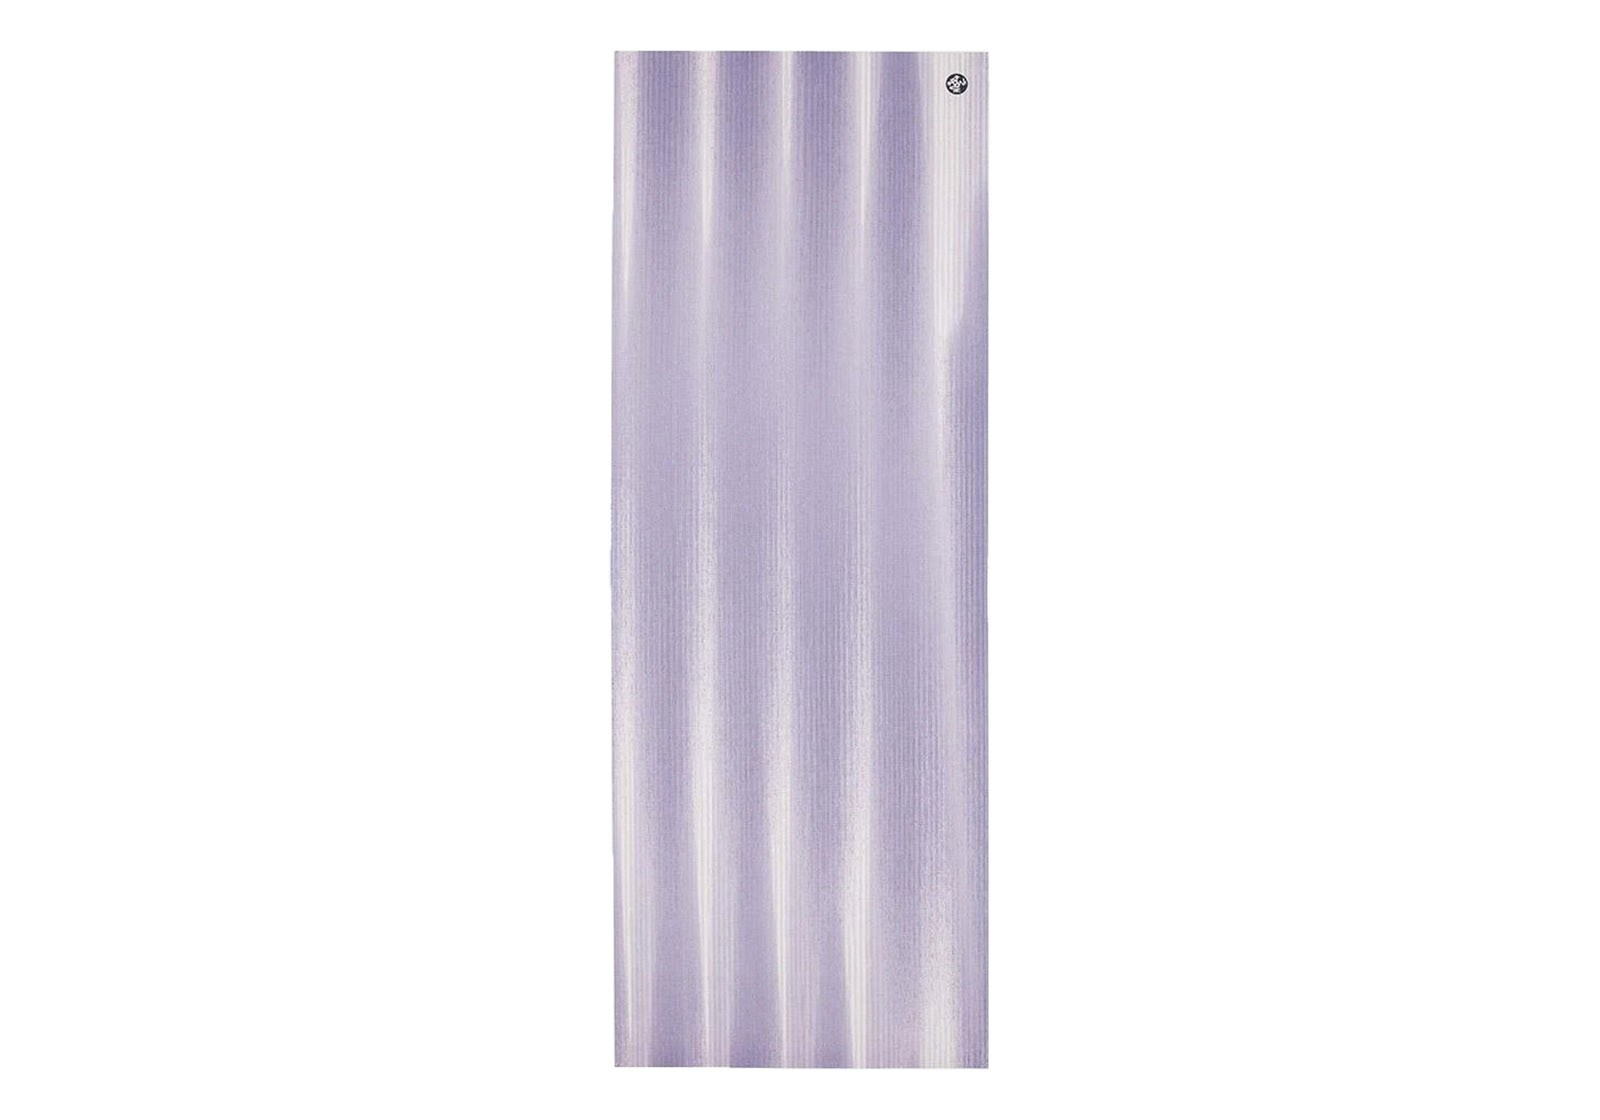 manduka-pro-amethyst-violet-lite-colorfields04